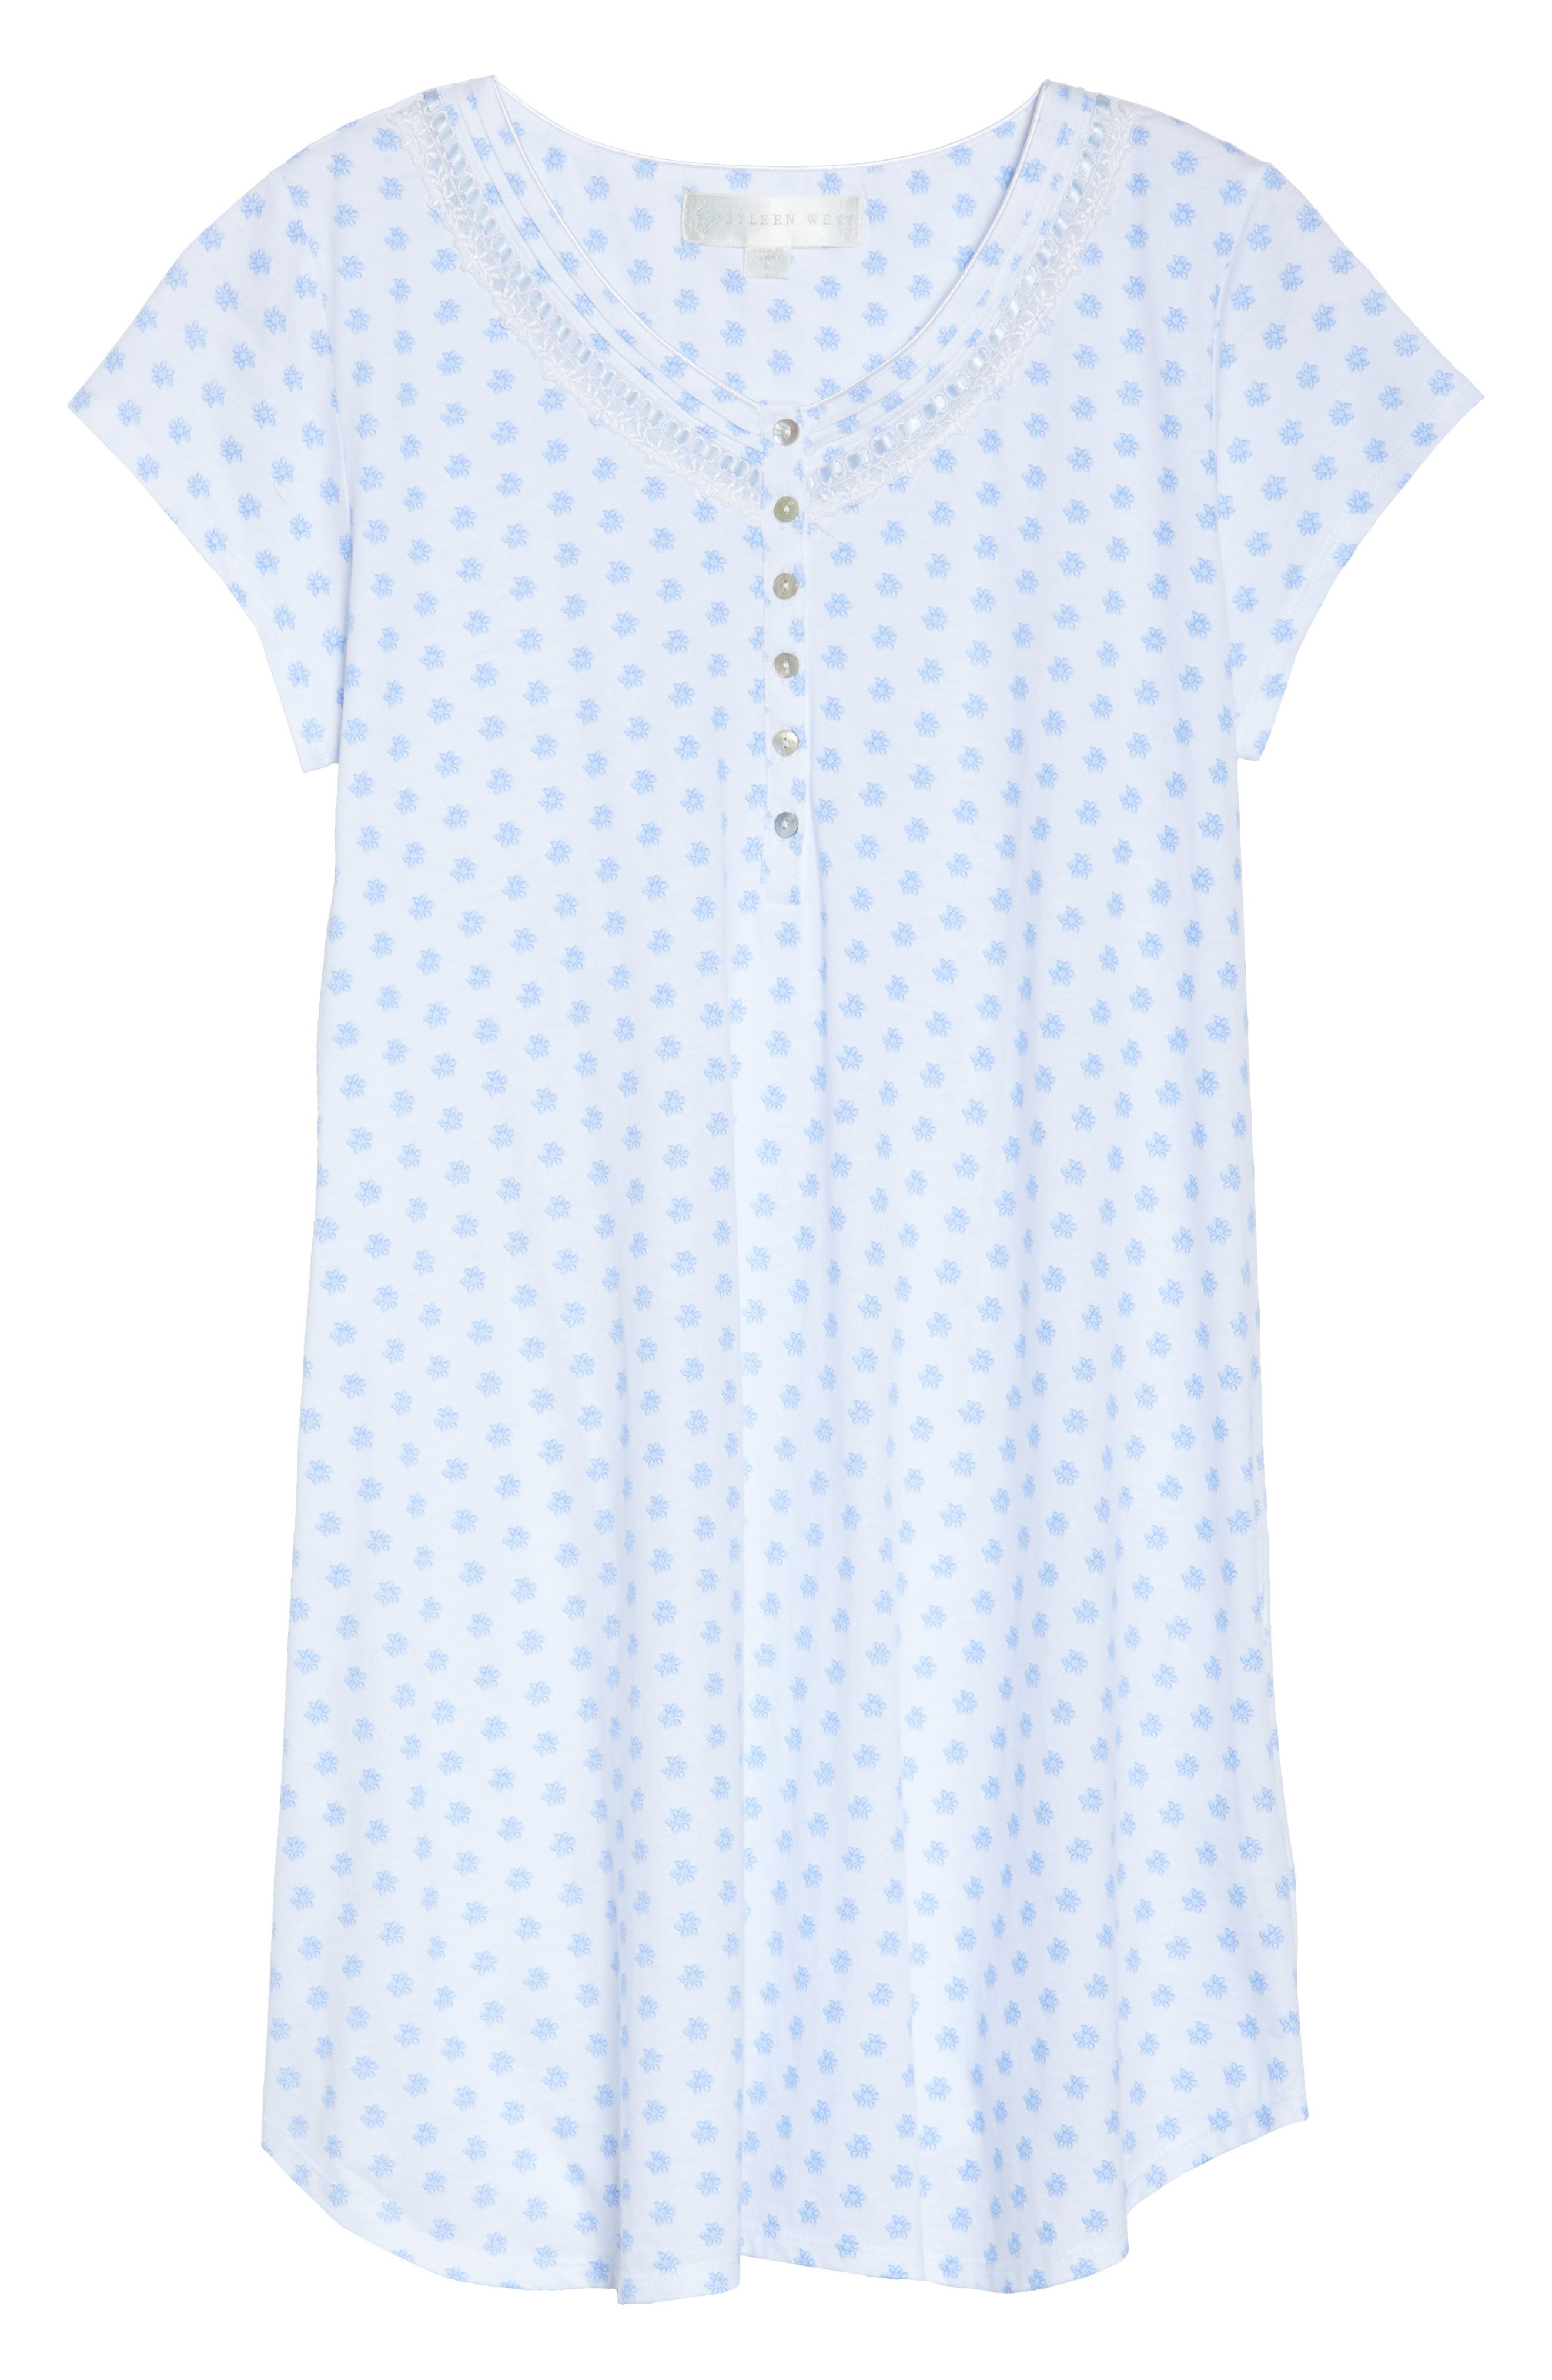 Jersey Sleep Shirt,                             Alternate thumbnail 4, color,                             White Blue Geo